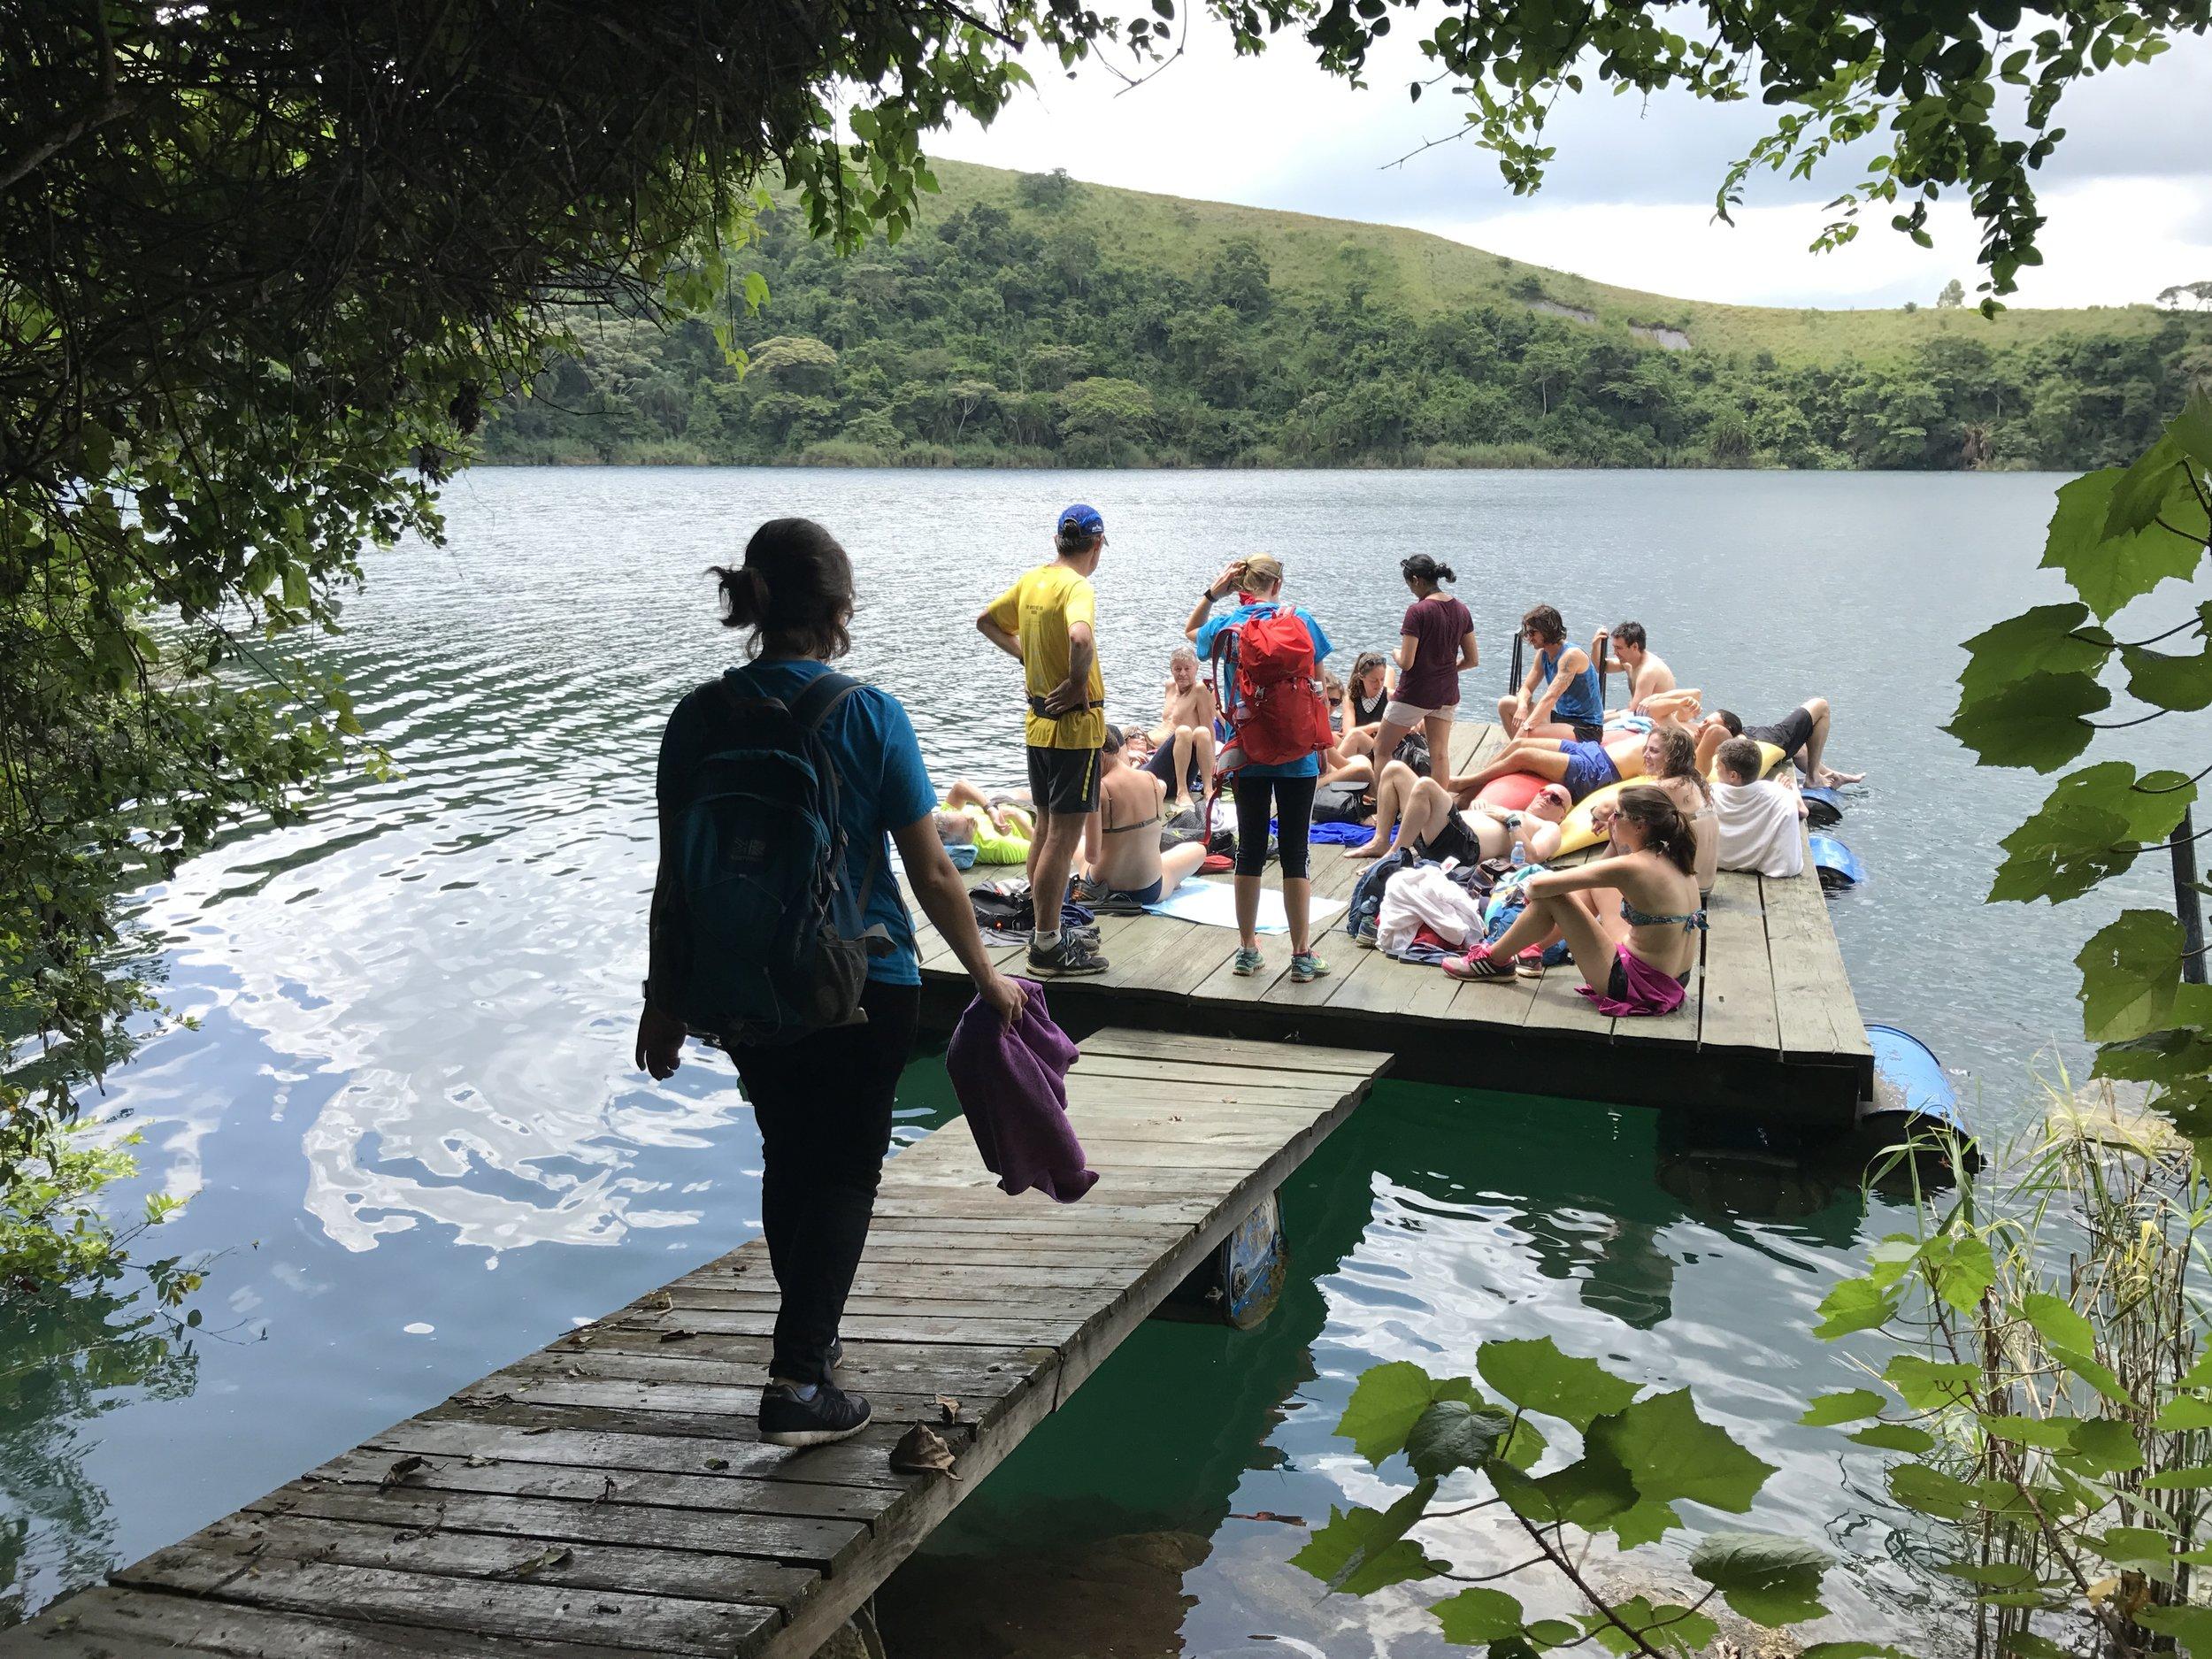 Sunbathe on the pontoon & swim in the lake!